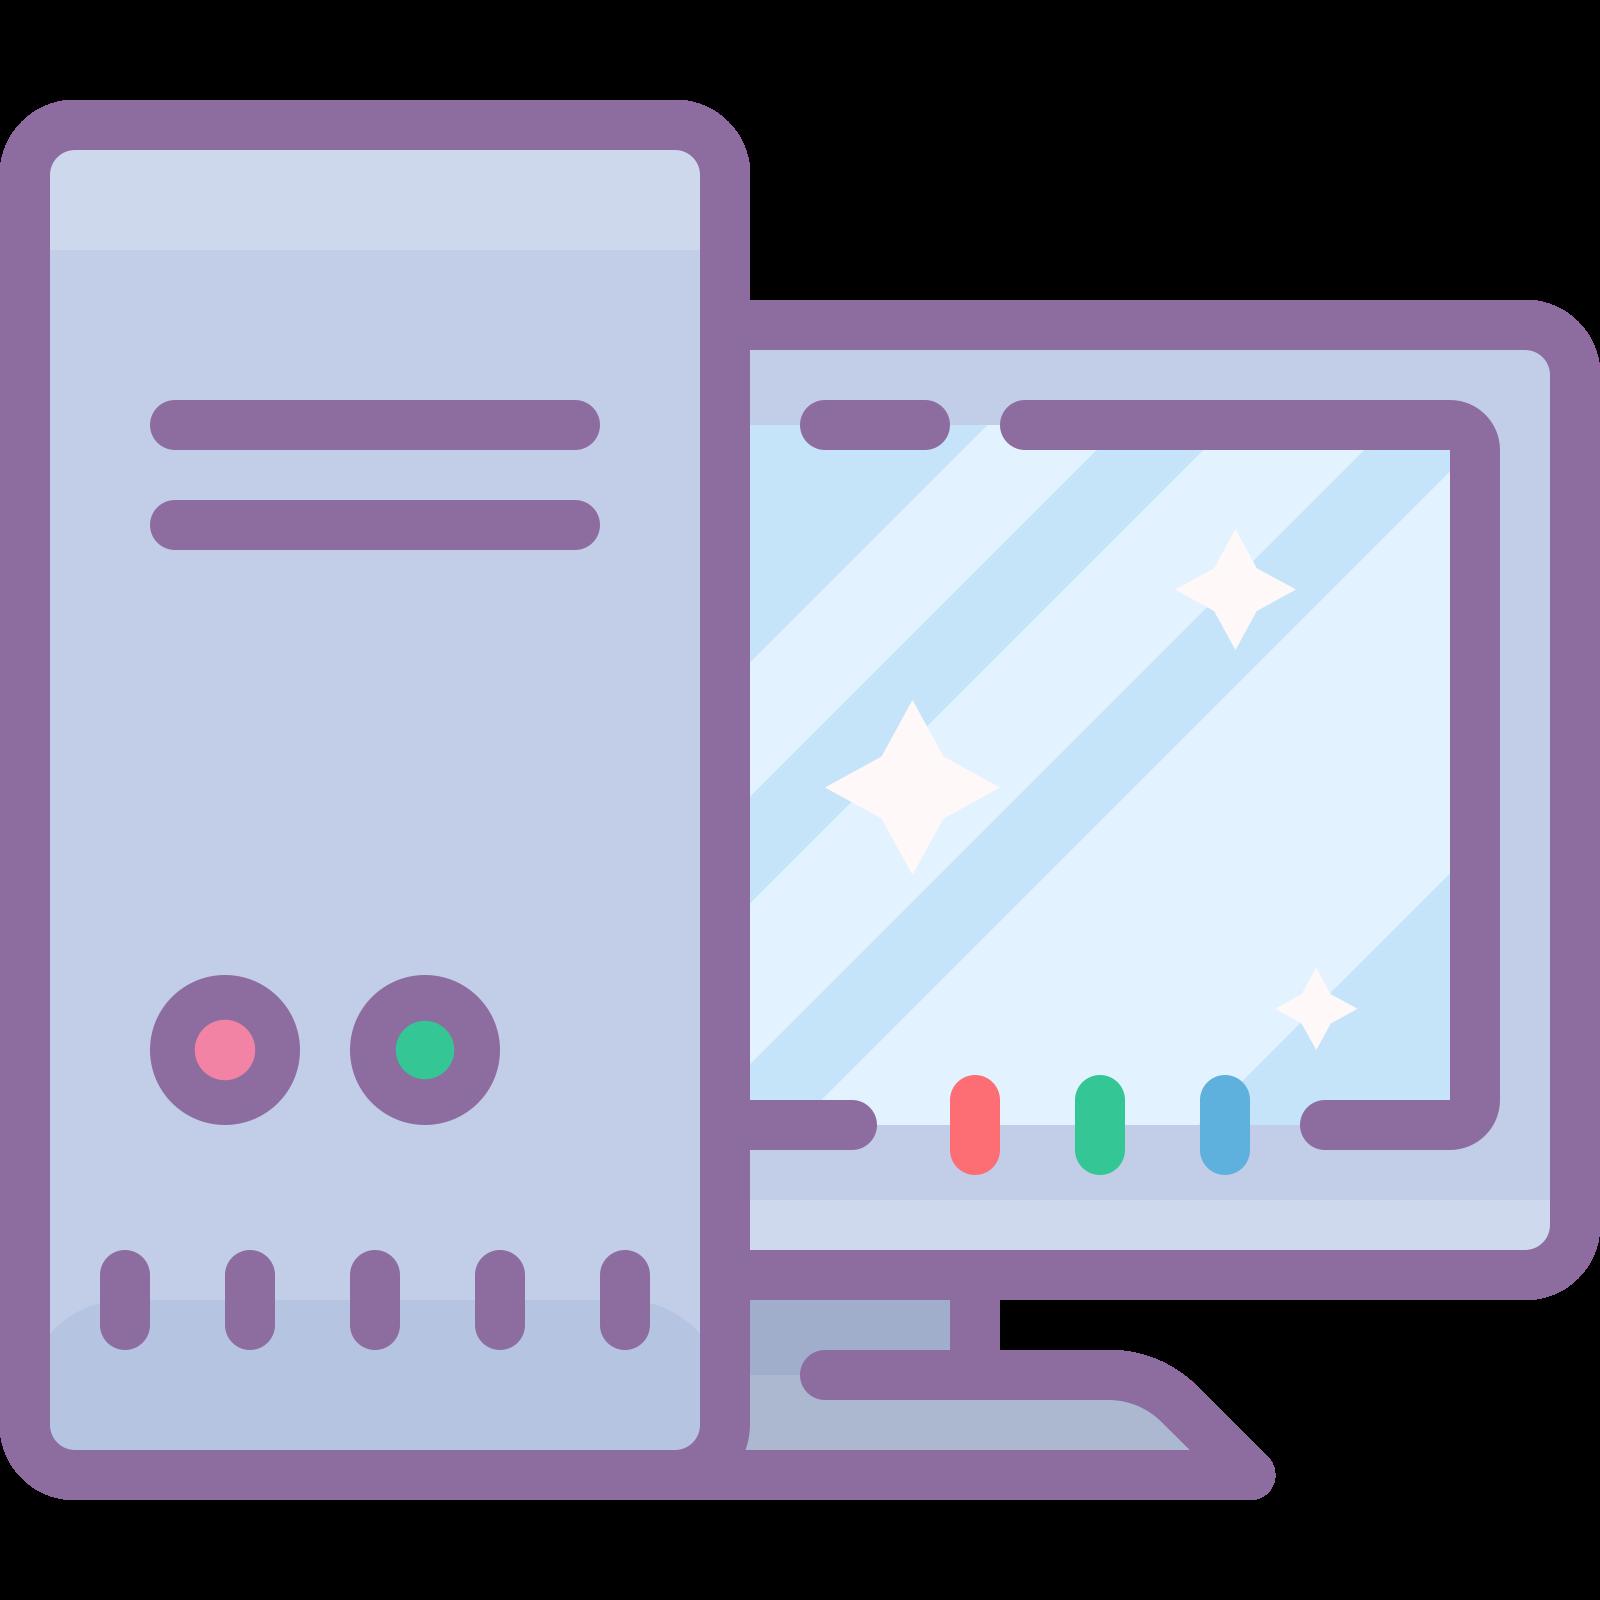 Workstation icon